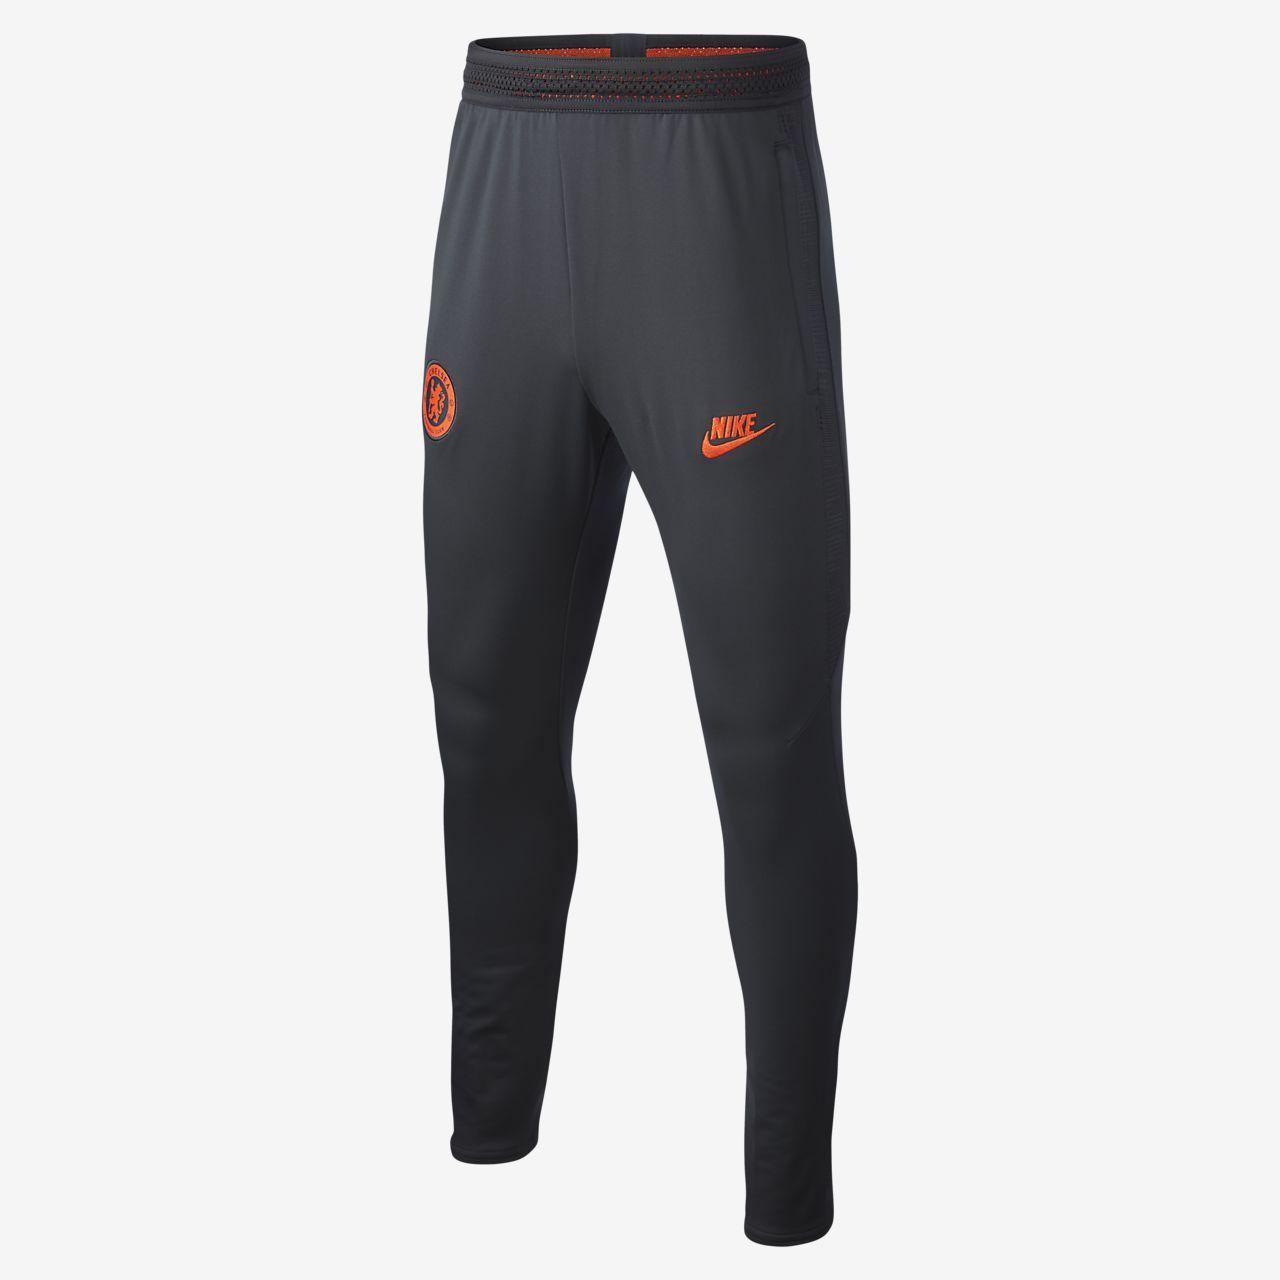 Nike Dri-FIT Chelsea FC Strike Pantalón de fútbol - Niño/a